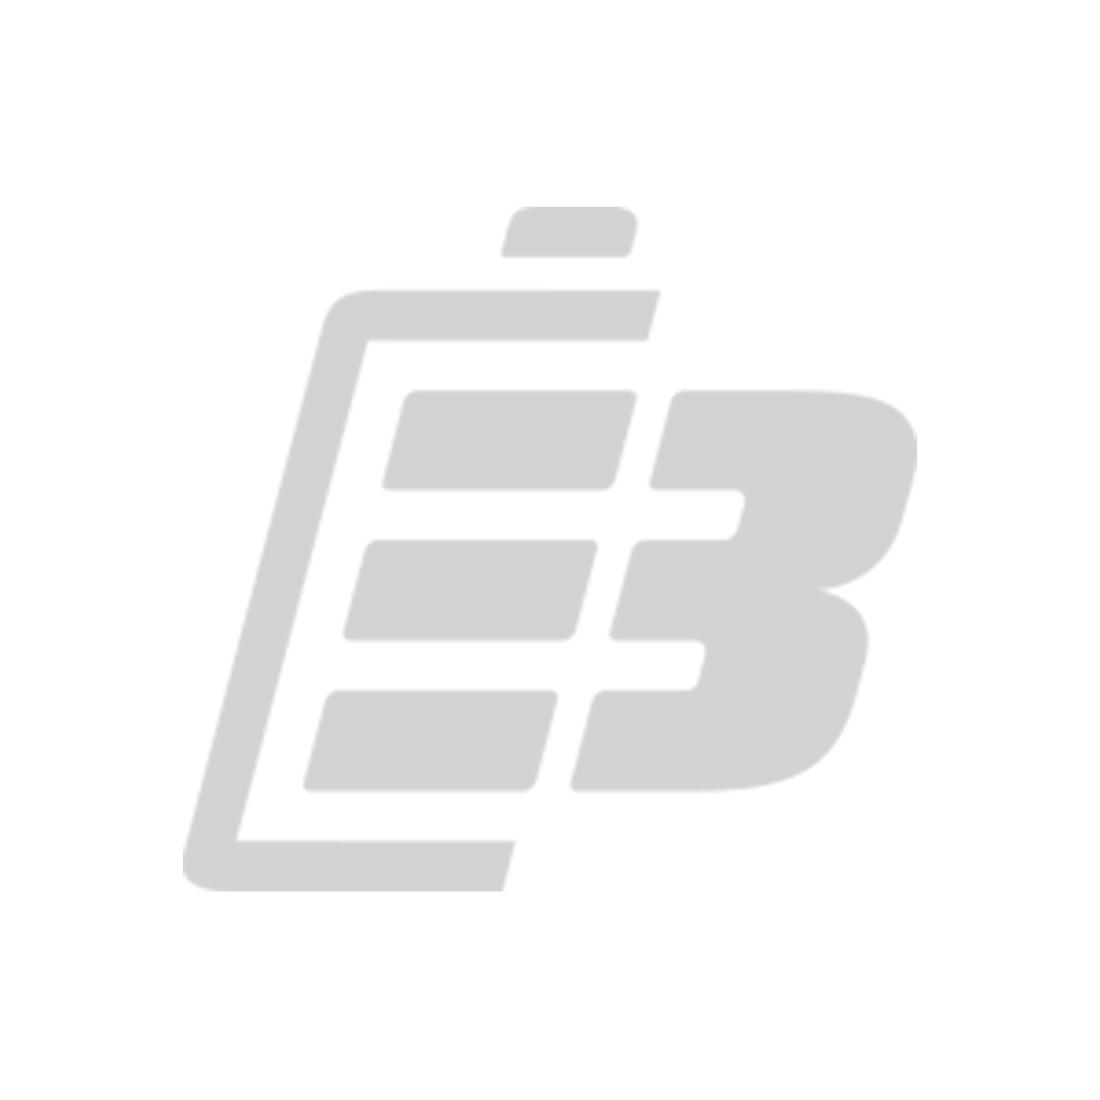 Netbook battery Acer Aspire One D250 2200mah black_1